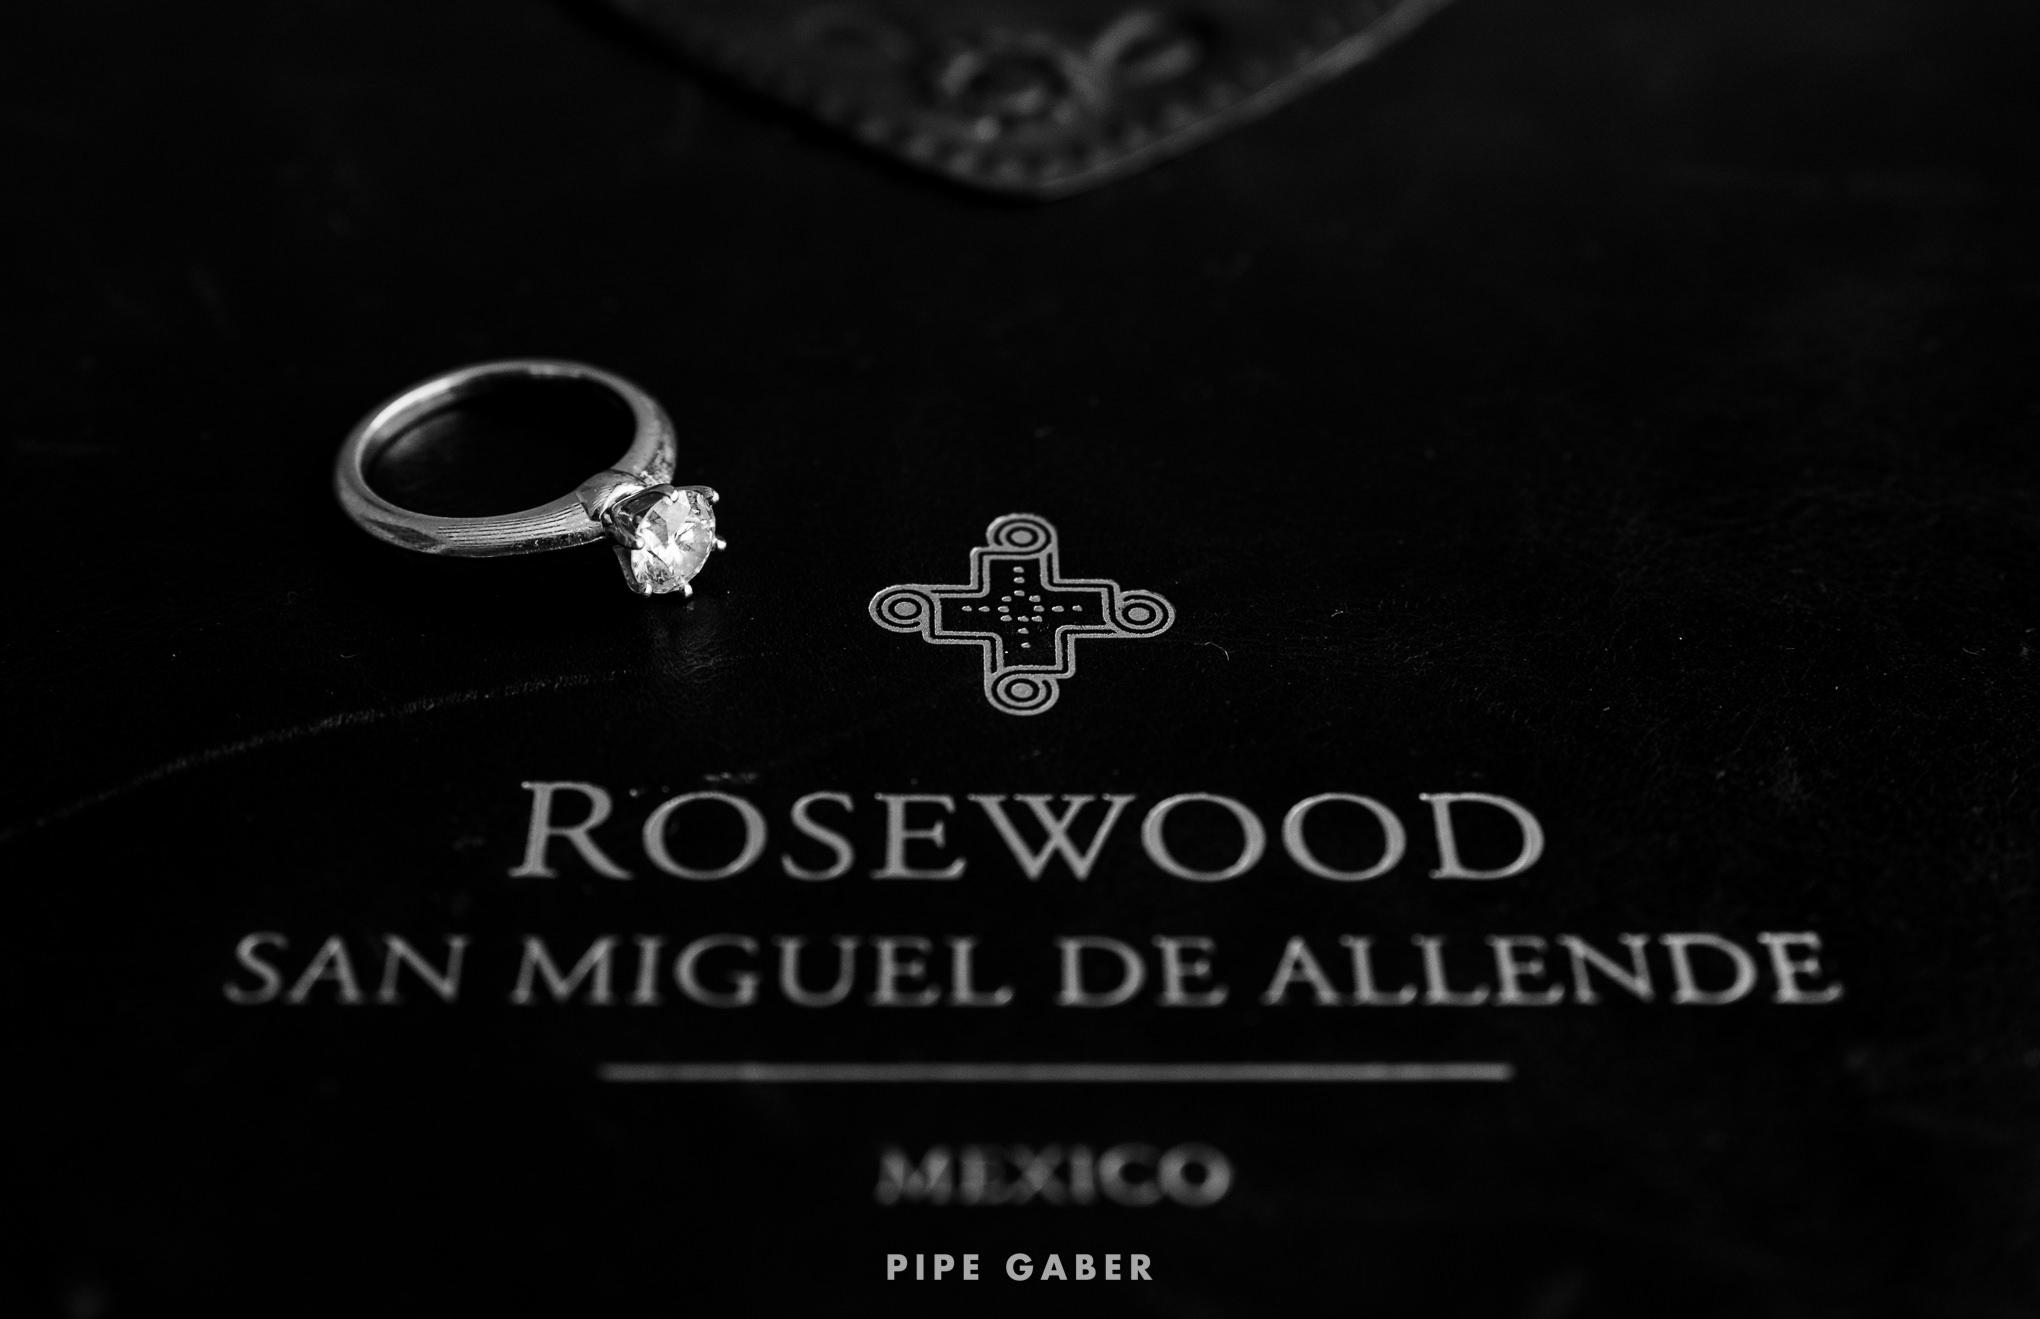 BODA_ROSEWOOD_SAN_MIGUEL_ALLENDE_PIPE_GABER_04.JPG